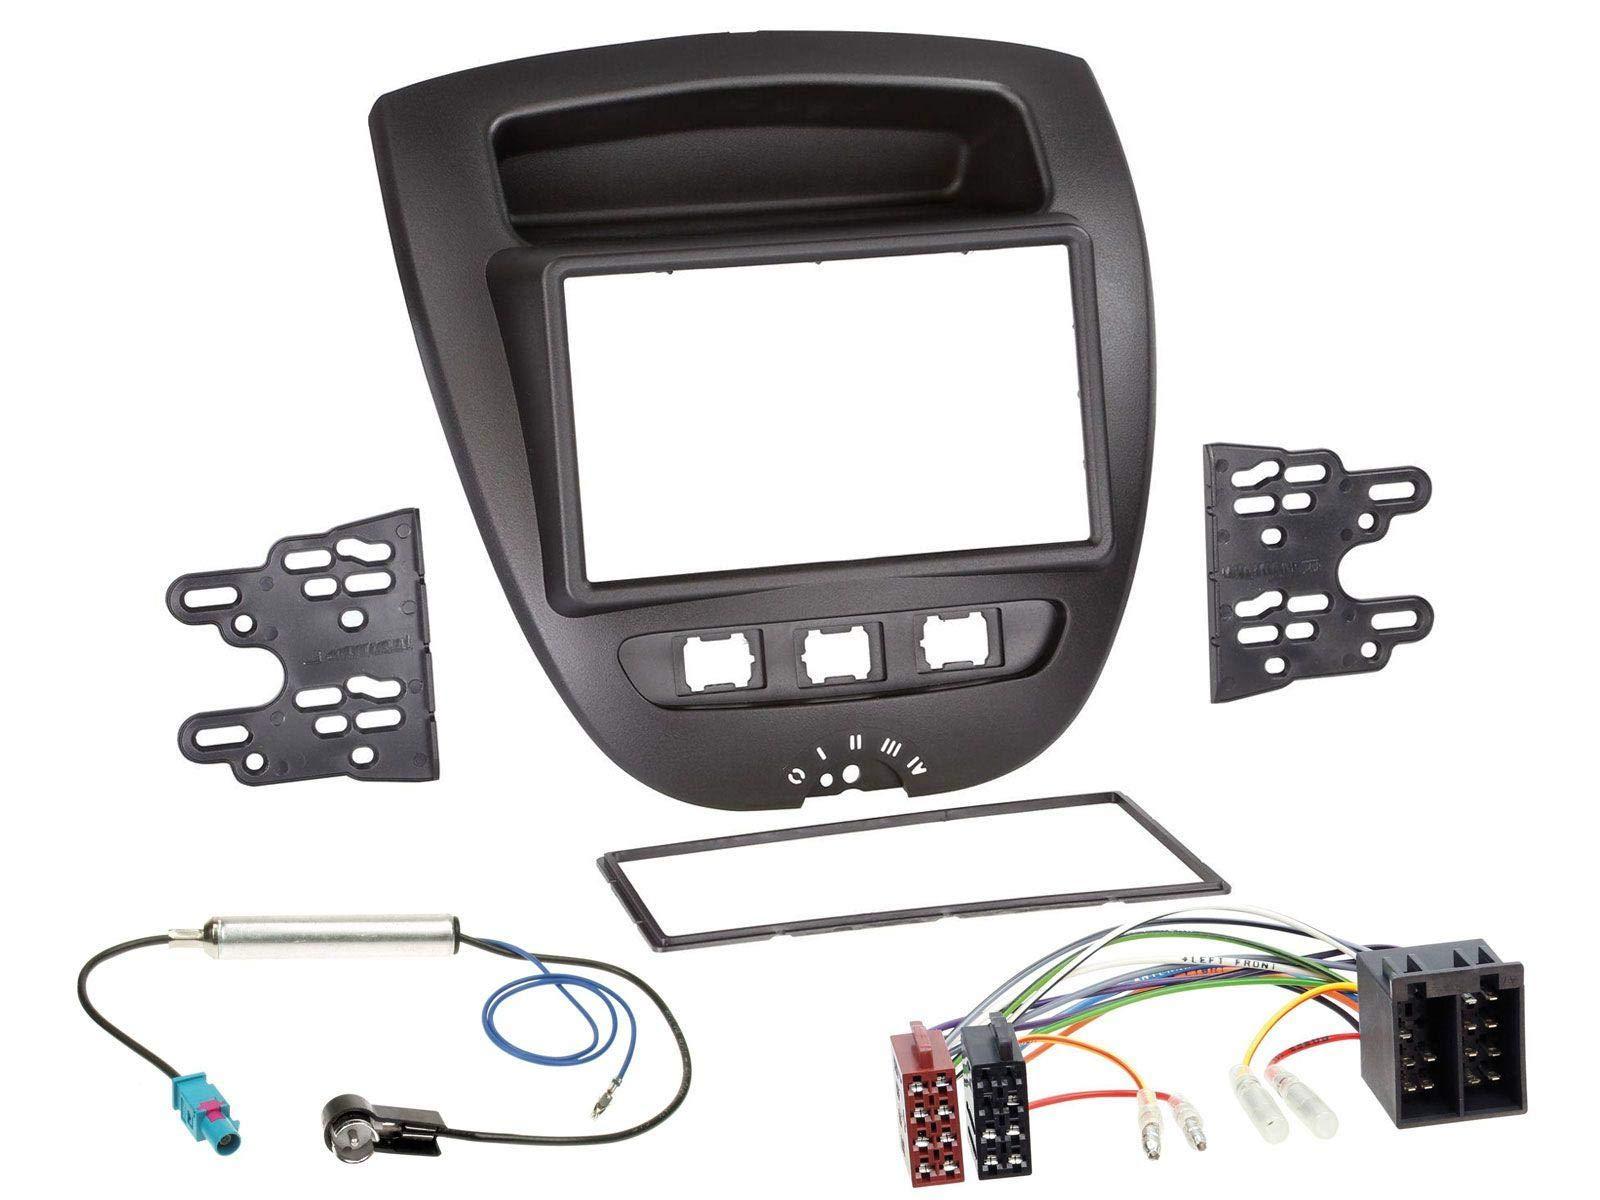 caraudio24-JVC-KW-DB93BT-Bluetooth-DAB-CD-MP3-2DIN-USB-Autoradio-fr-Toyota-Aygo-Peugeot-107-Citroen-C1-05-14-Fakra